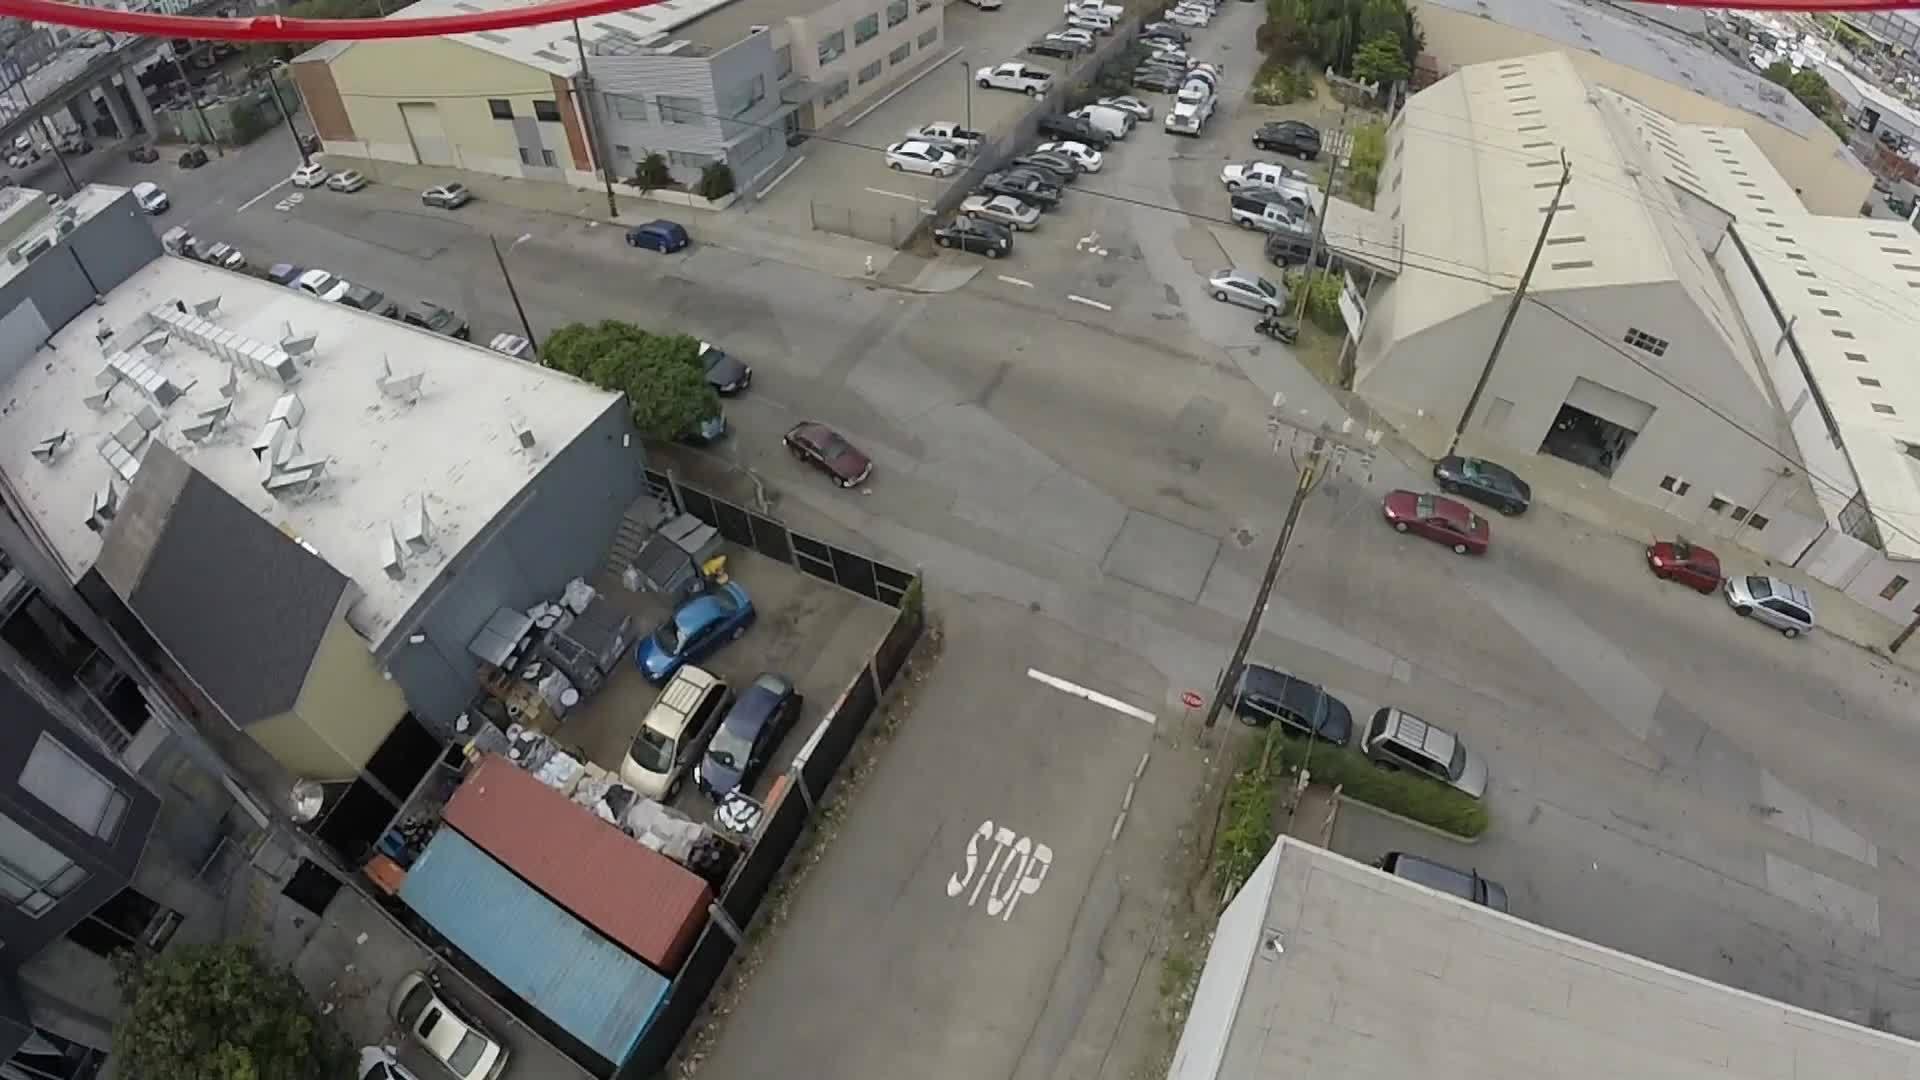 dogpatch, drone, drone footage, drones, san francisco, Drone footage from San Francisco in Dogpatch #8 GIFs